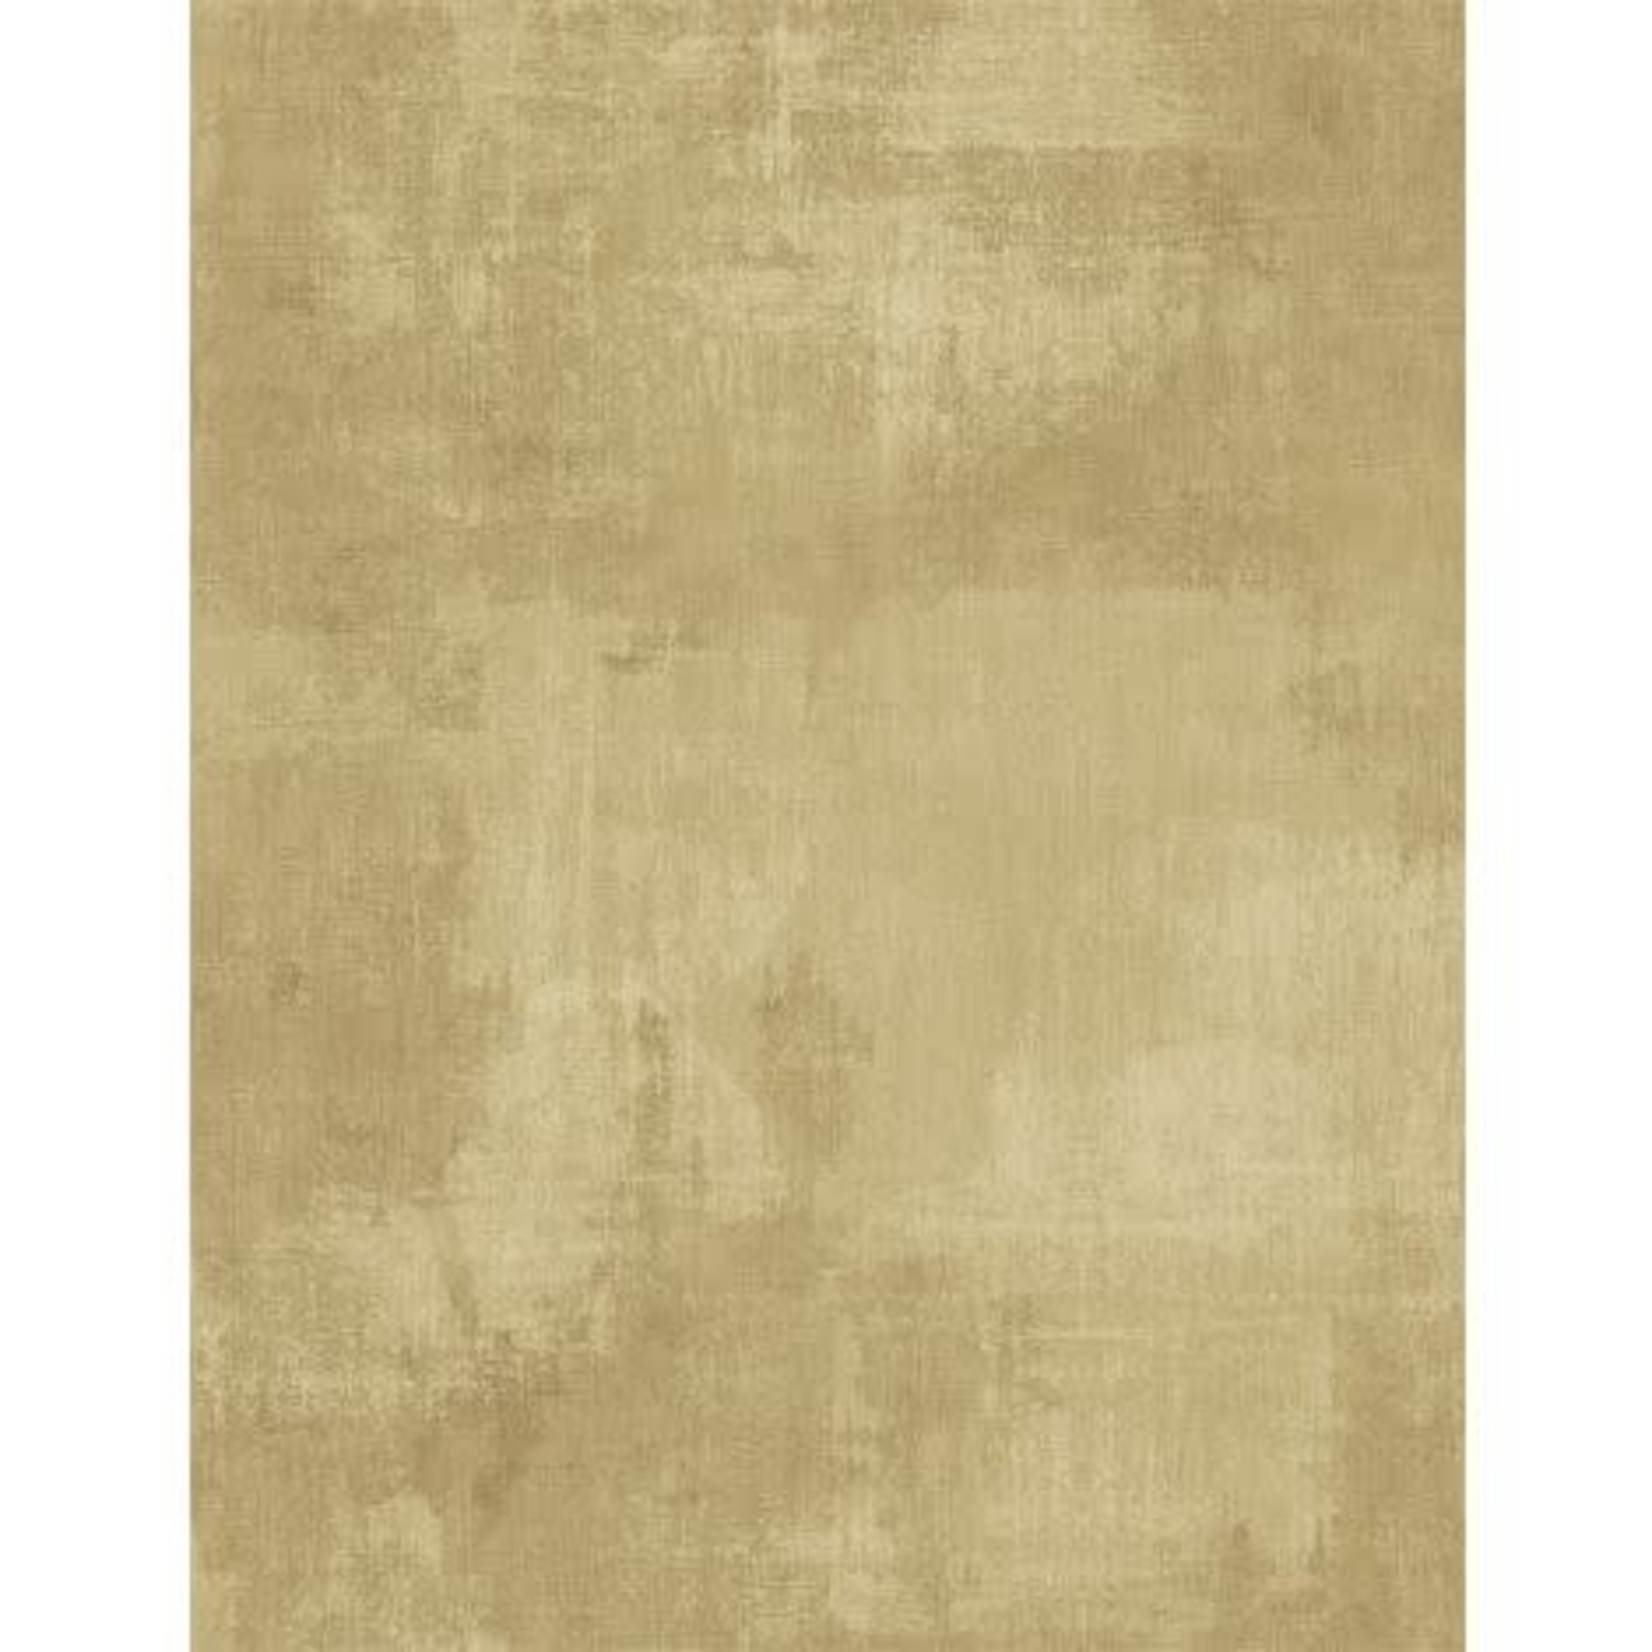 WILMINGTON PRINTS Essentials Flannel, Sand - Per Cm or $20/m